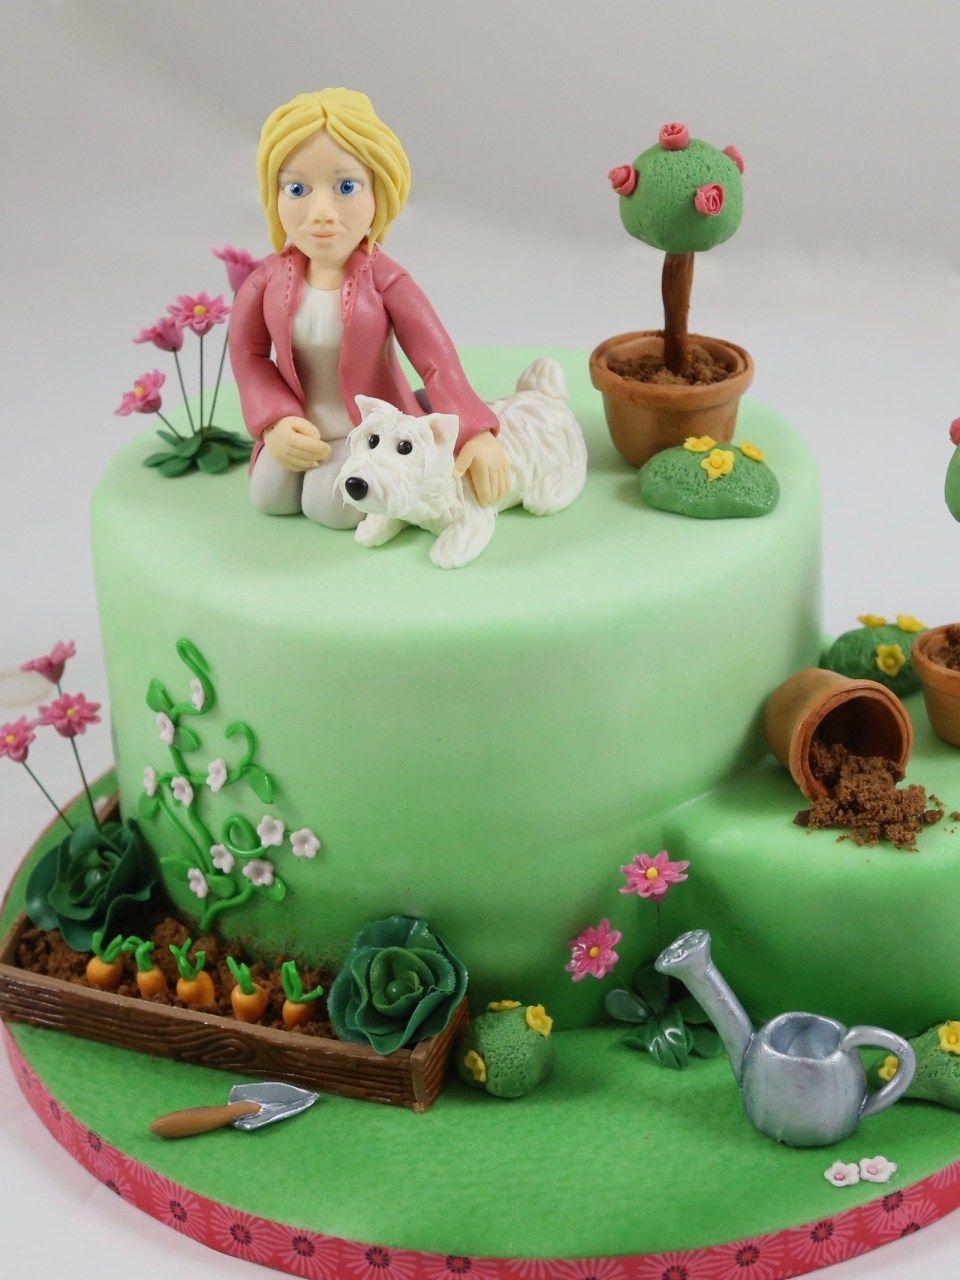 Gardener Cake Torte Gartnerin Garten Hund Gemuse Vegetables Themenbezogene Torten Motivtorten Torten